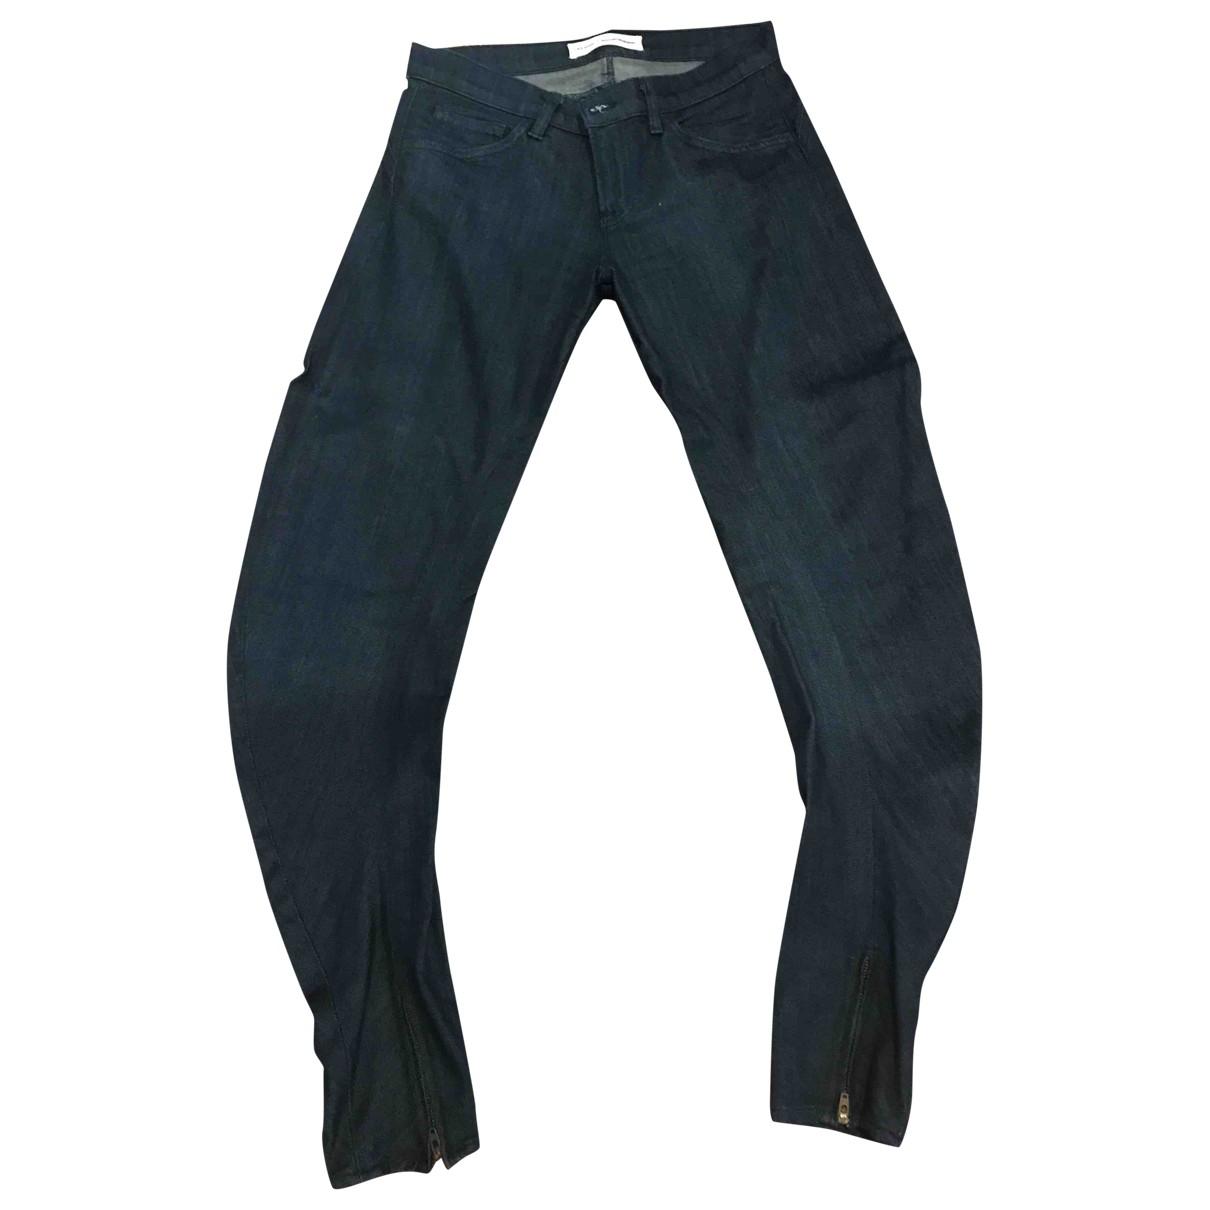 J Brand \N Blue Denim - Jeans Trousers for Women 4 US